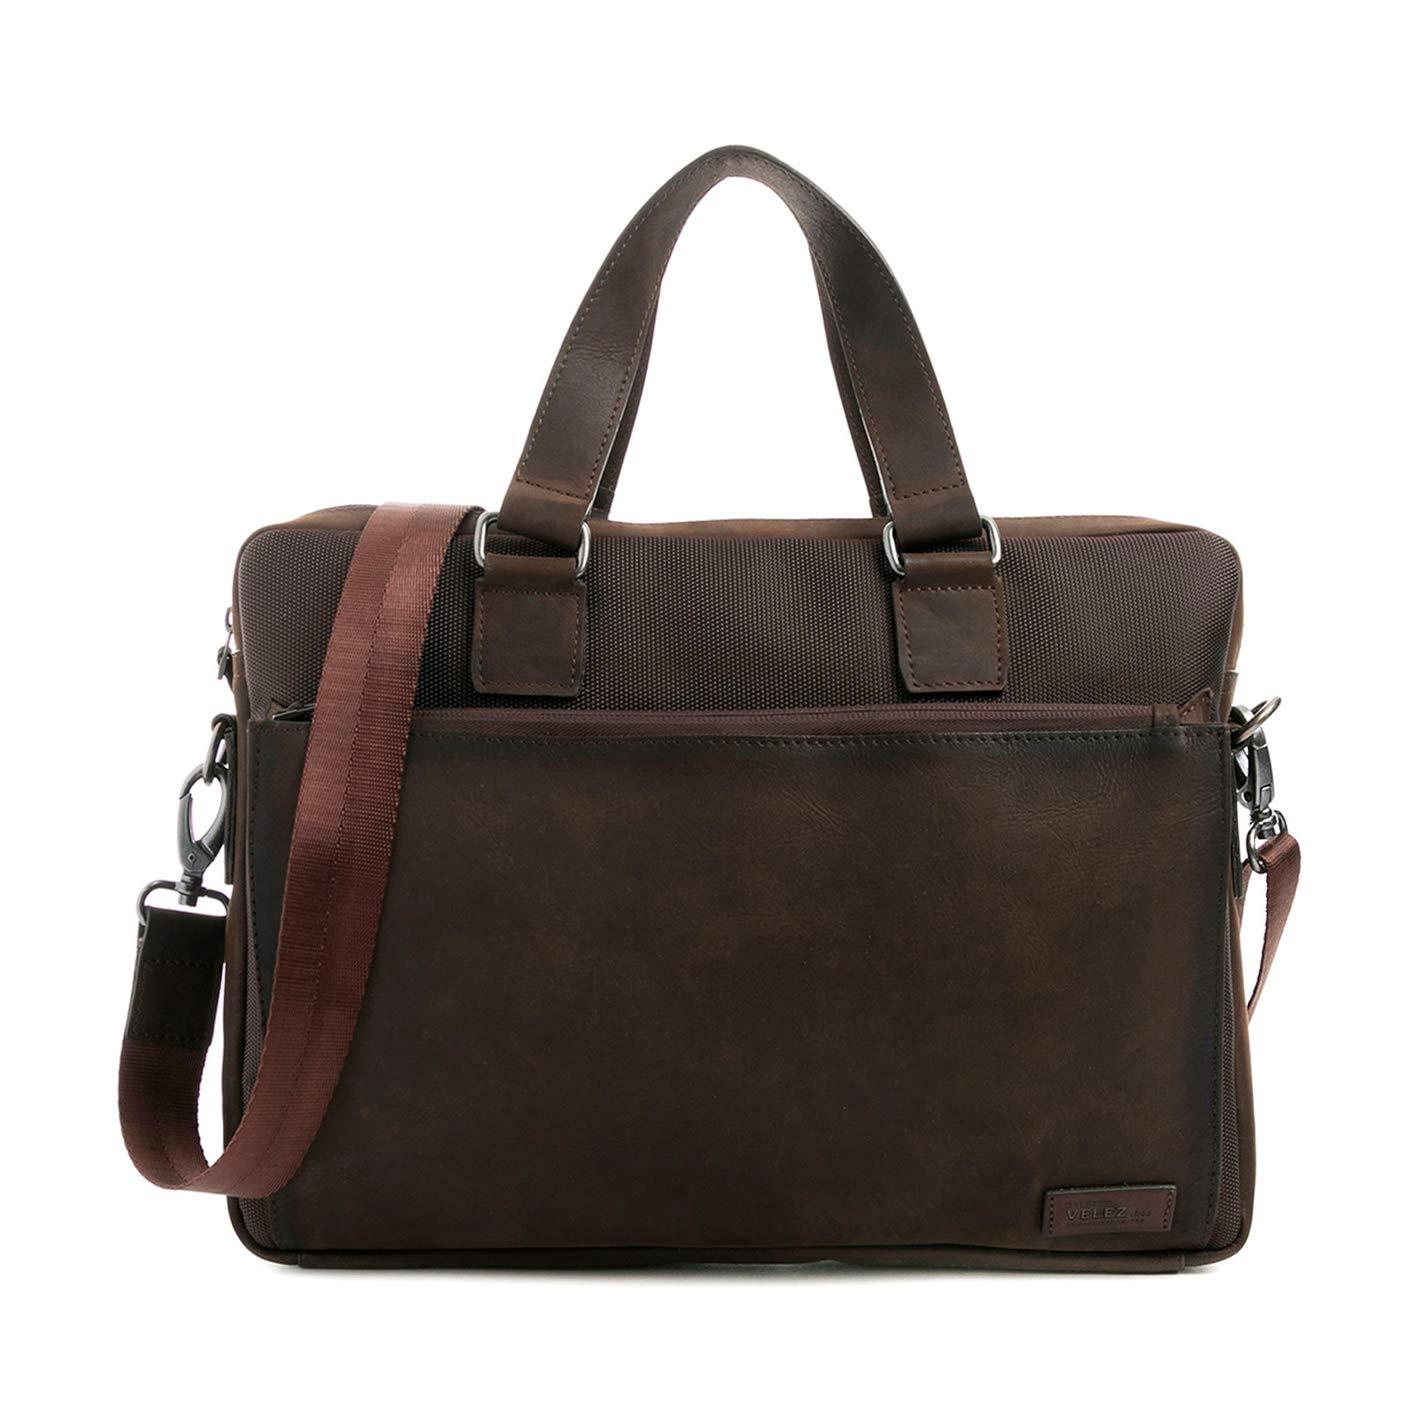 Velez Mens Genuine Colombian Leather Business Travel Laptop Bag | Maletin y Bolso de Cuero Colombiano para Hombres Brown